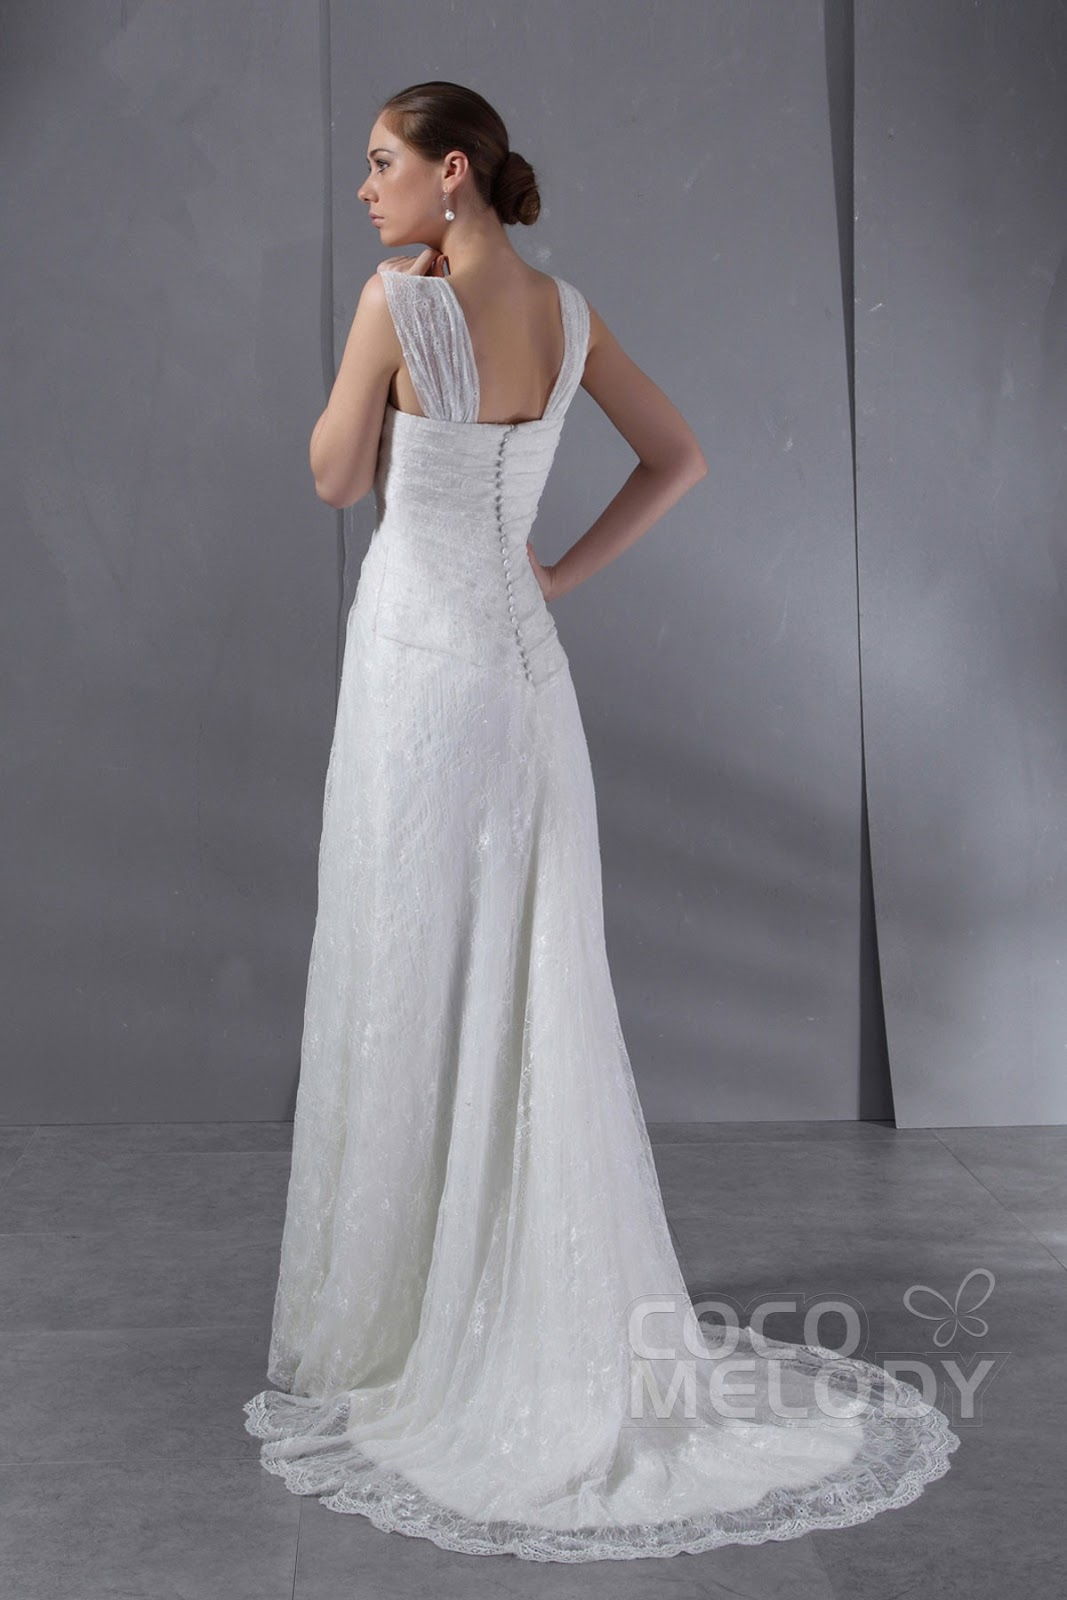 flower girl dresses : Amazing wedding dresses have already been ...